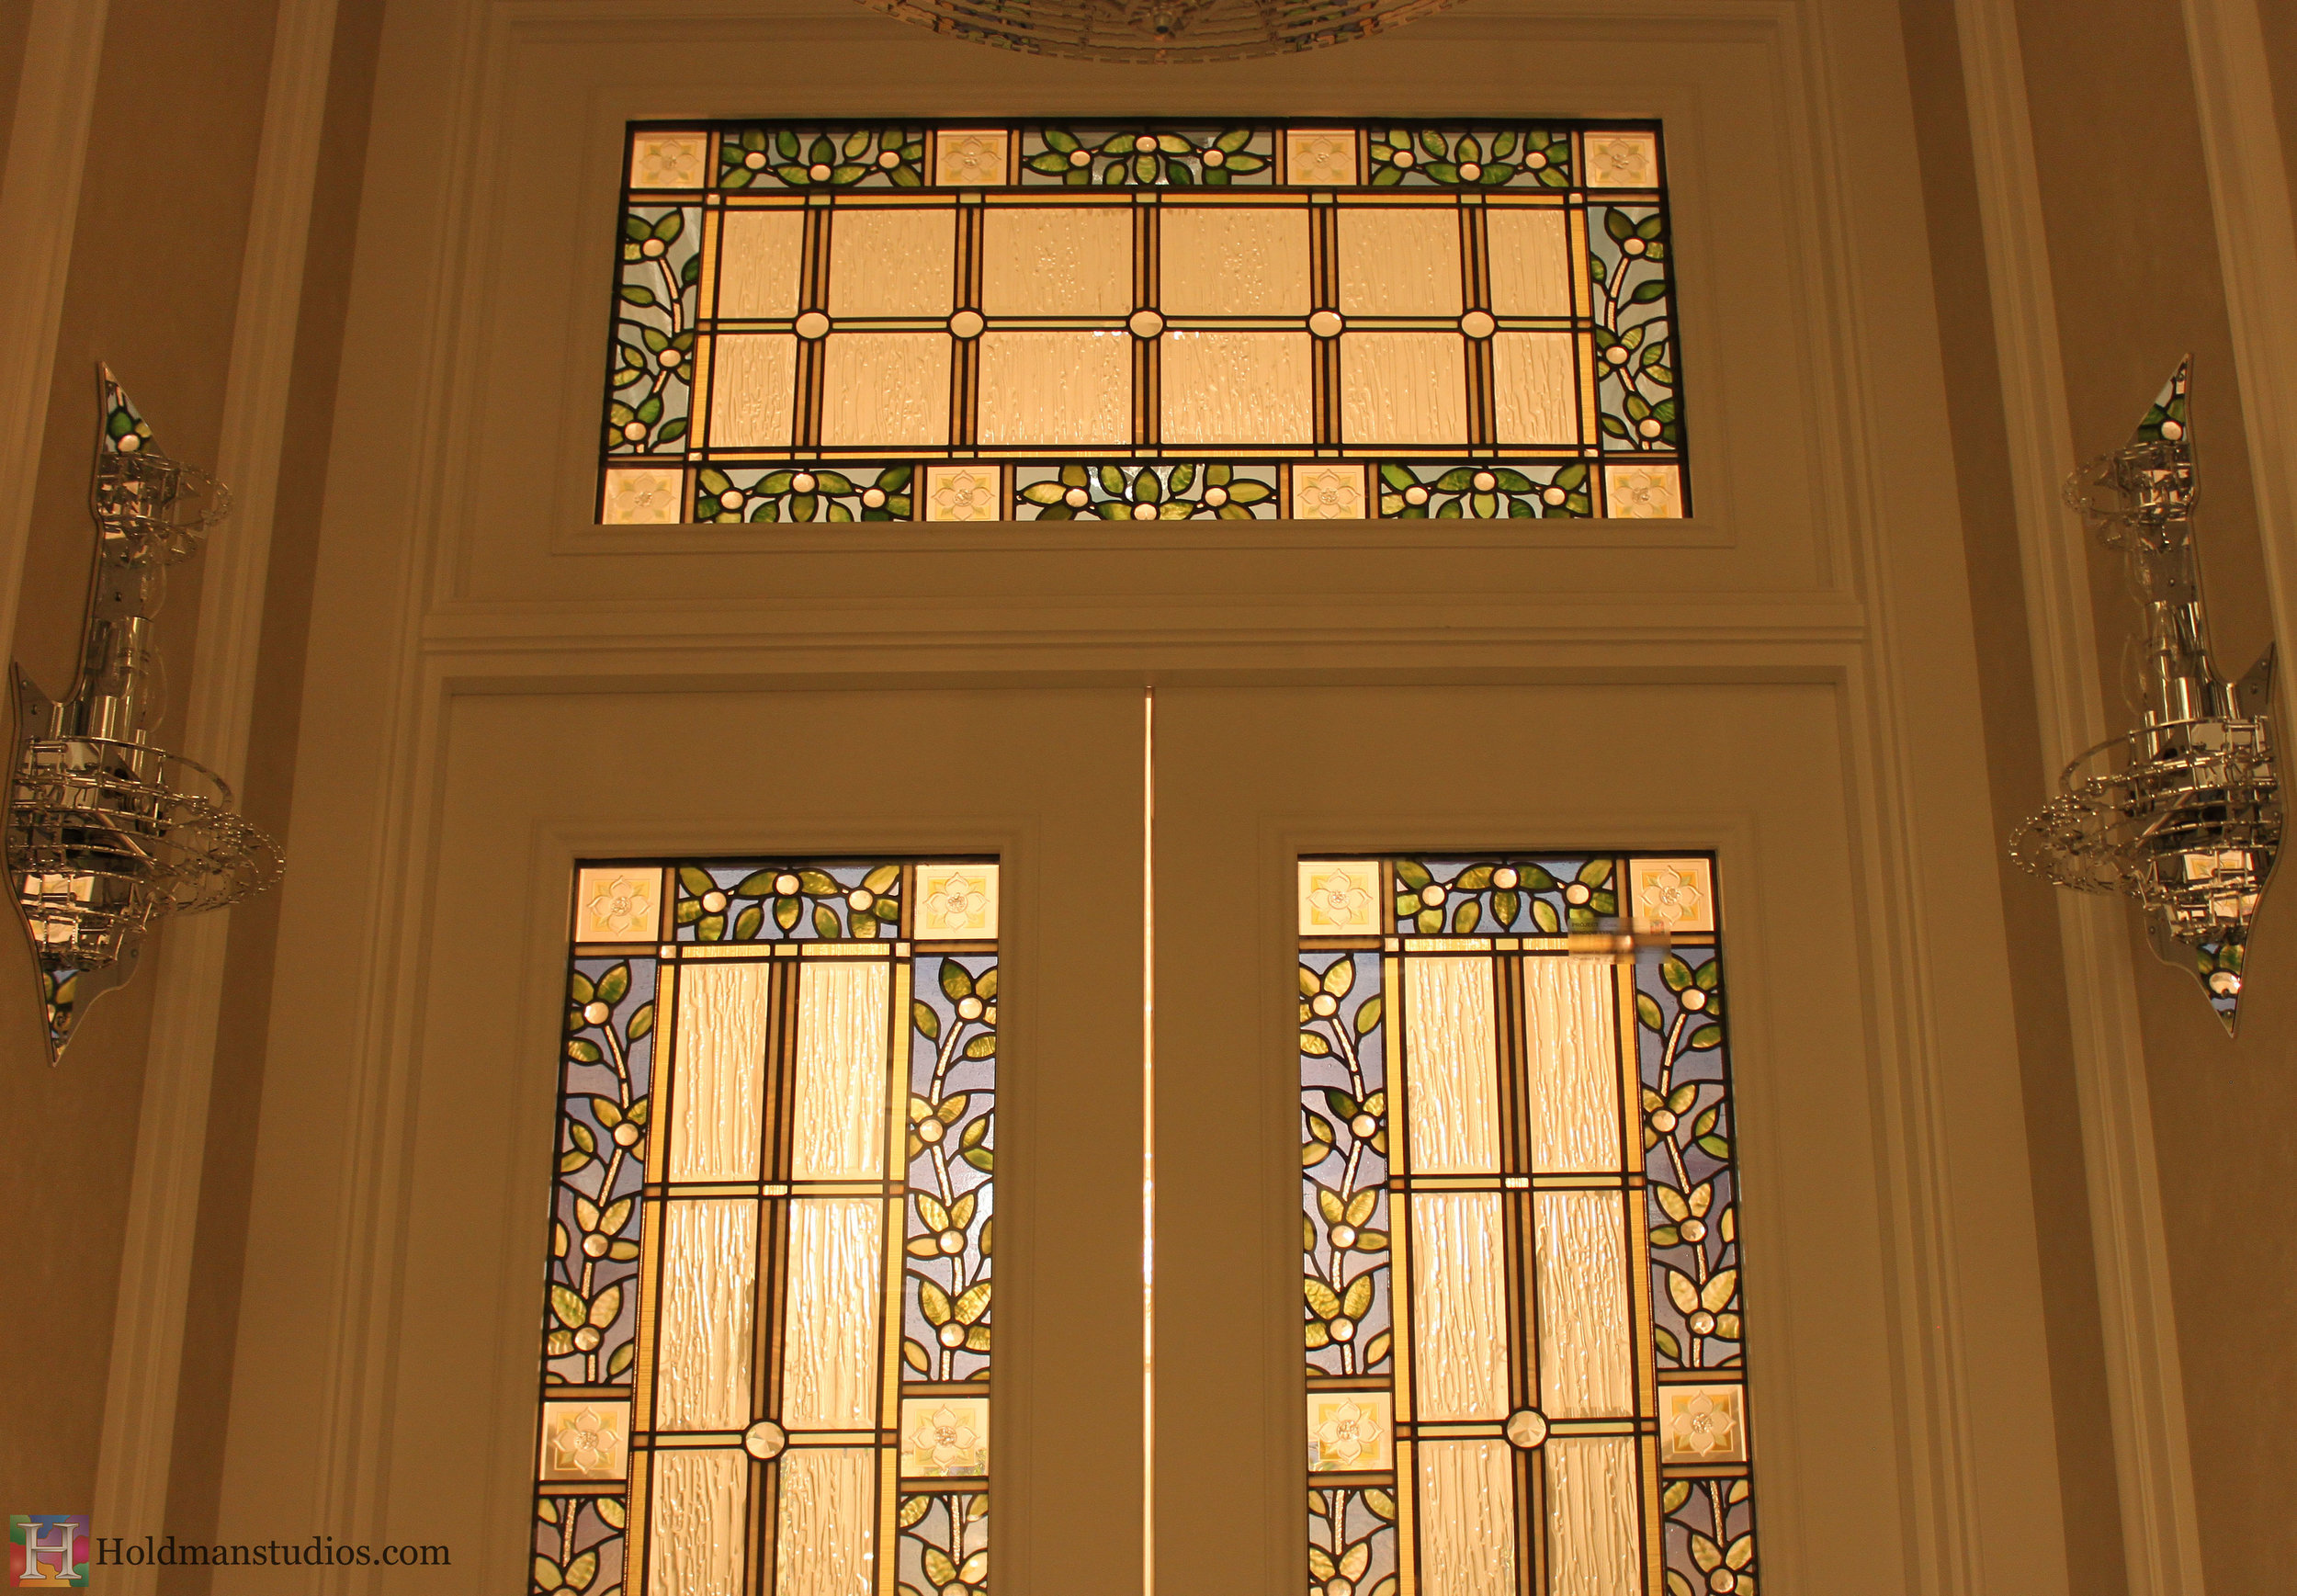 Holdman_Studios_Stained_Art_Glass_LDS_Mormon_Temple_Boise_Idaho_Potato_Flowers_Door_Windows_Transoms_Closeup.jpg